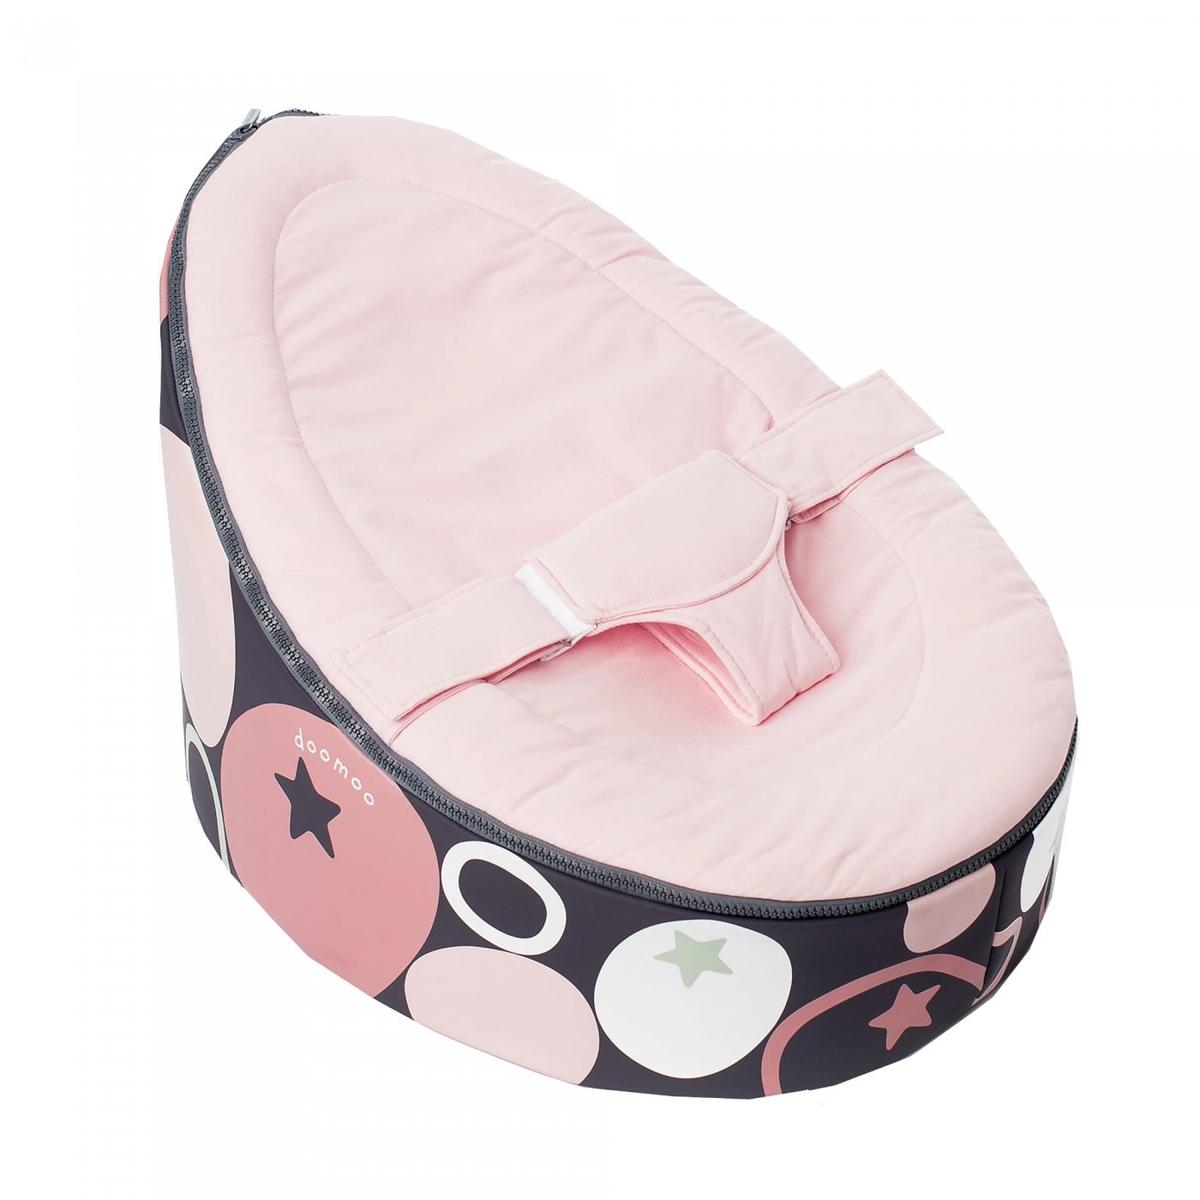 Stones Pink - Sitterit - 5400653999181 - 14